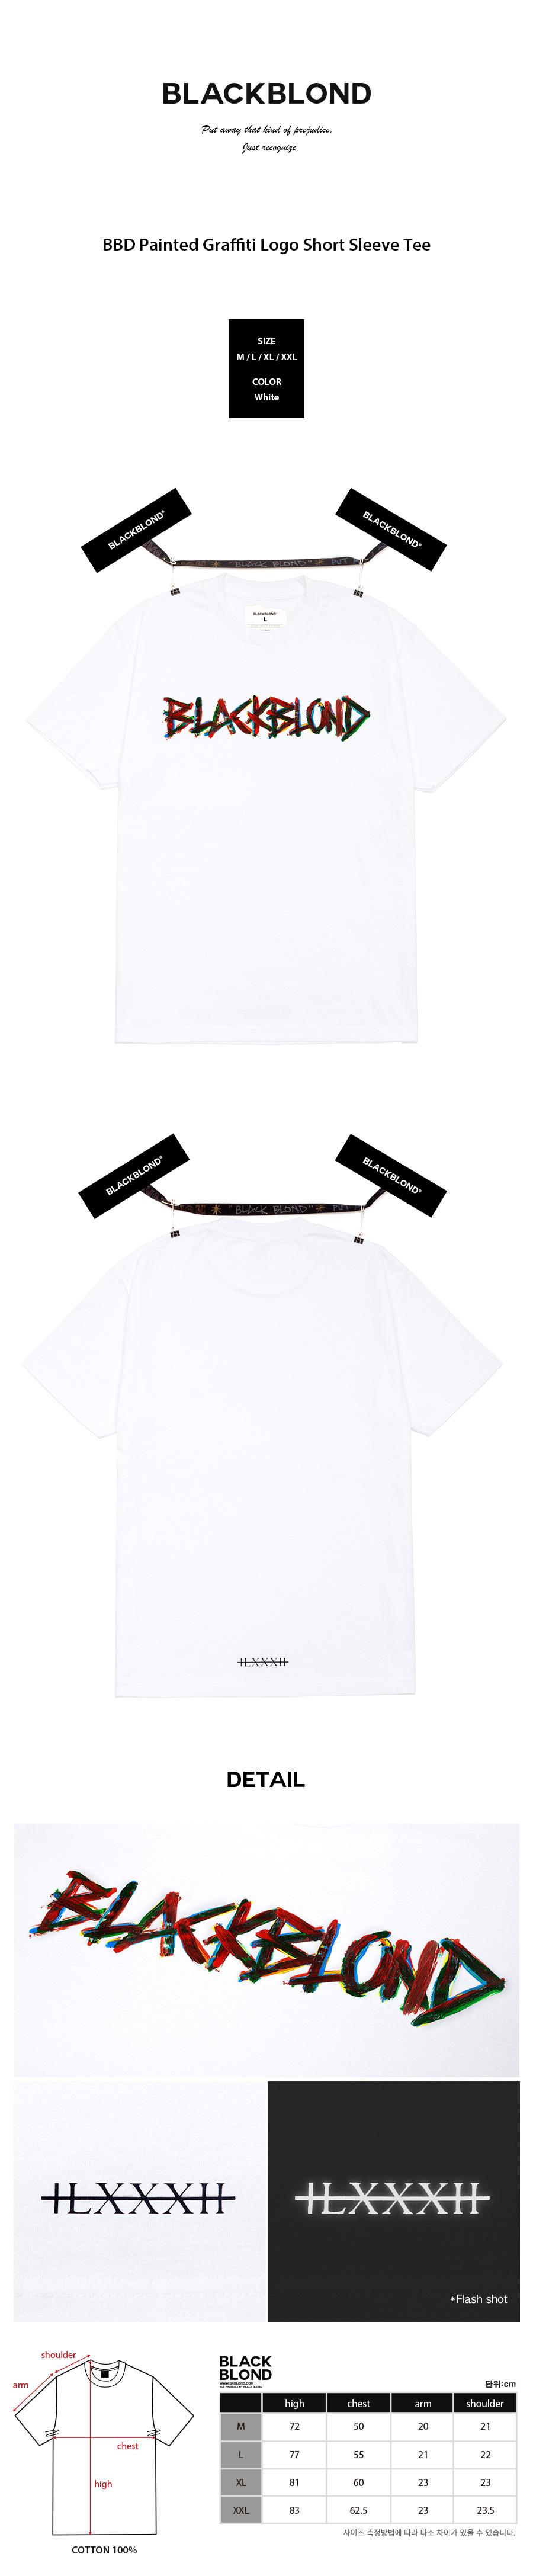 BLACKBLOND - BBD Painted Graffiti Logo Short Sleeve Tee (White)